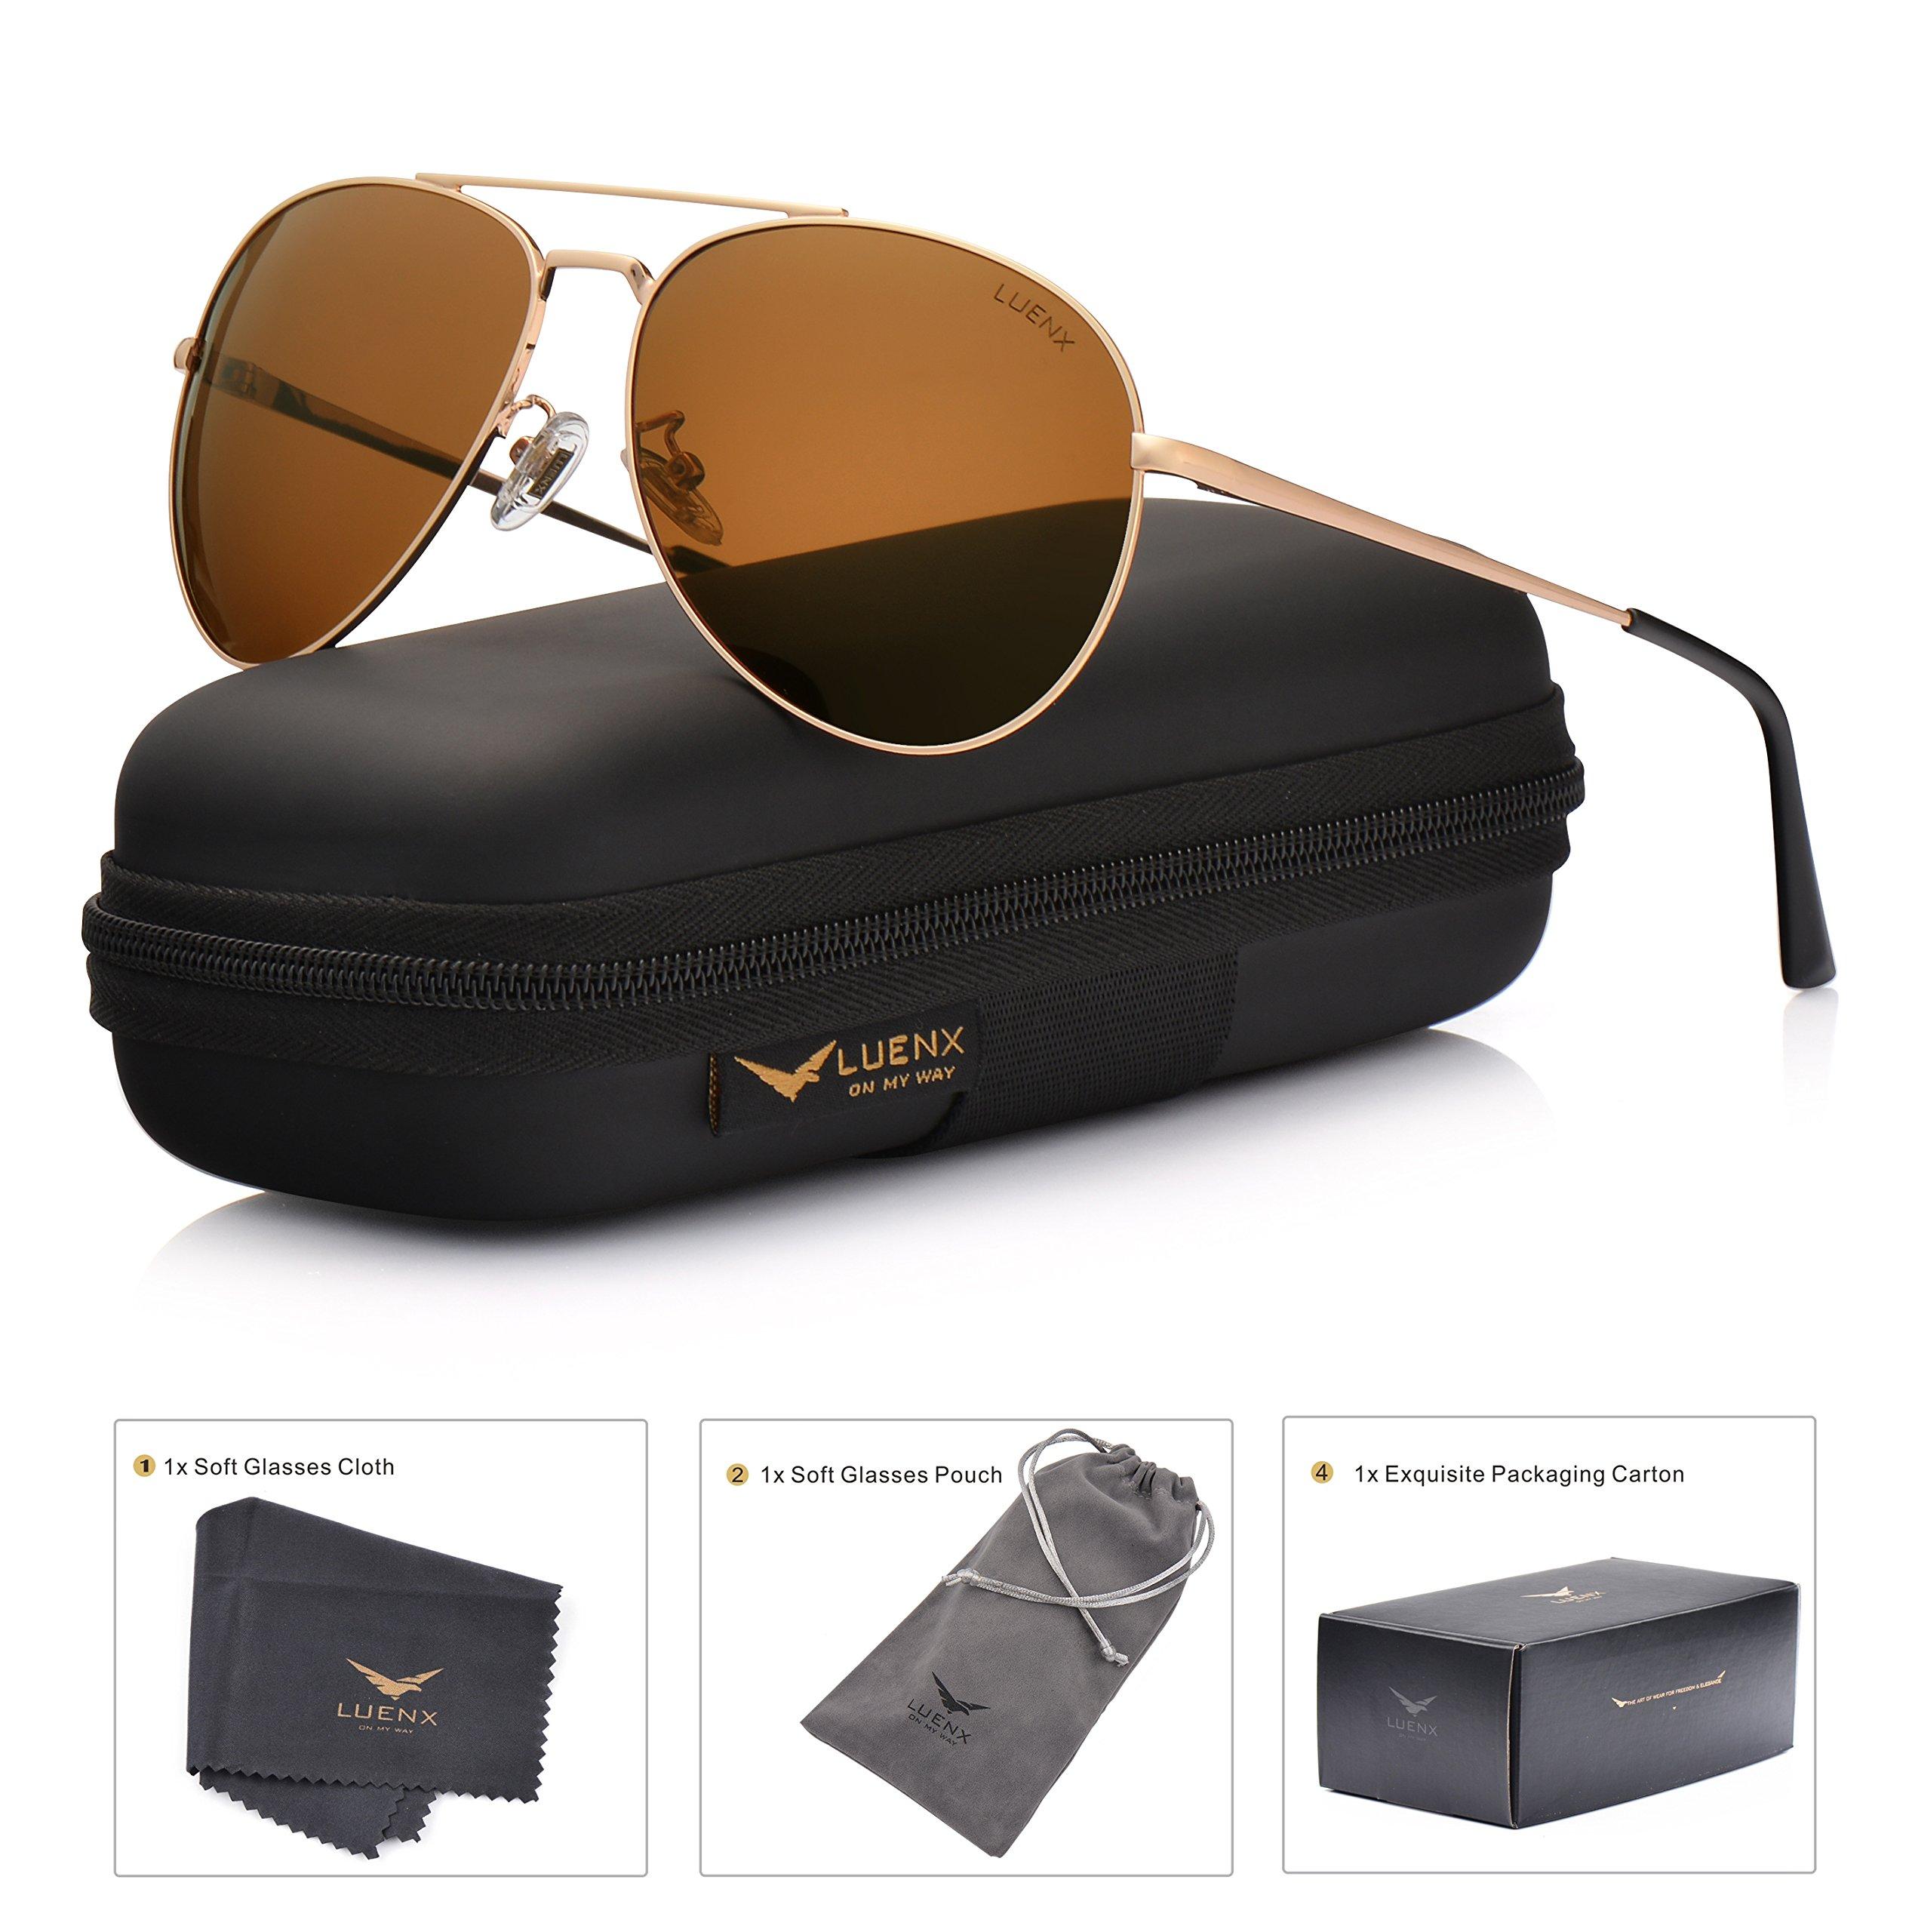 LUENX Aviator Sunglasses Polarized Men Women with Accessories Metal Frame UV 400 60MM (14-brown, 60)